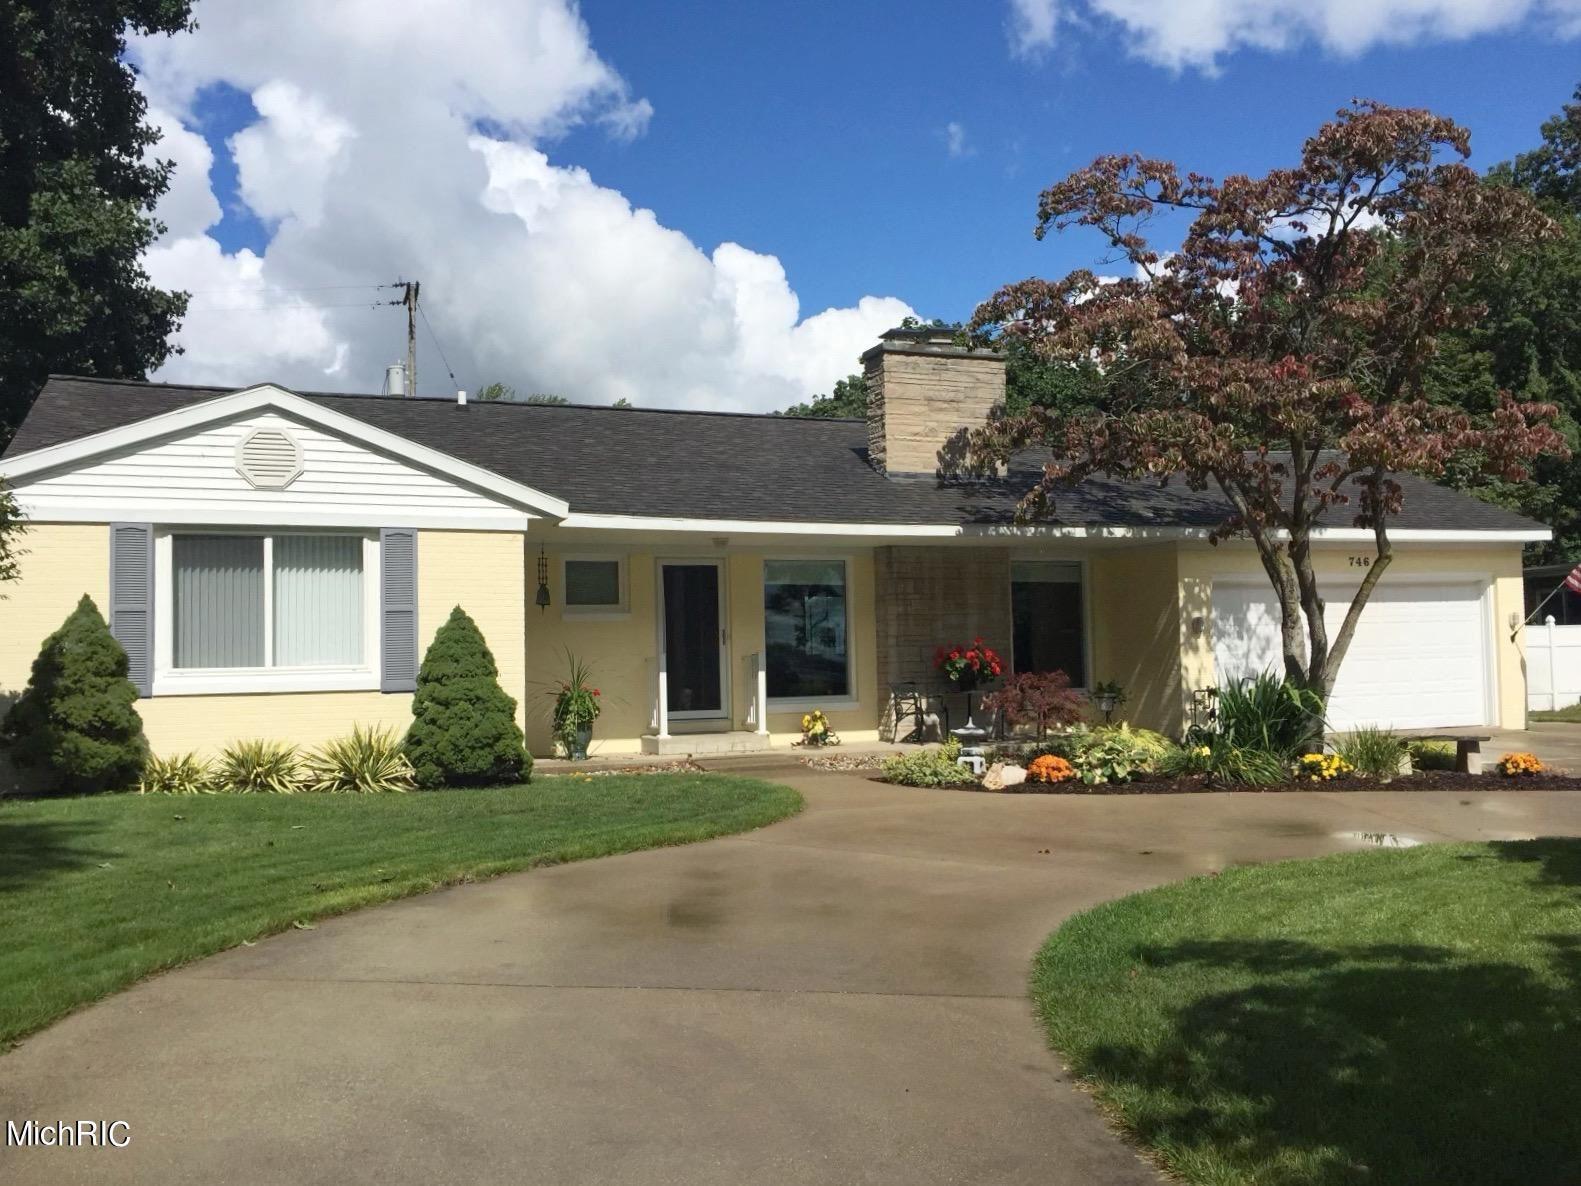 Photo of 746 Ruddiman Drive, Muskegon, MI 49445 (MLS # 21006147)